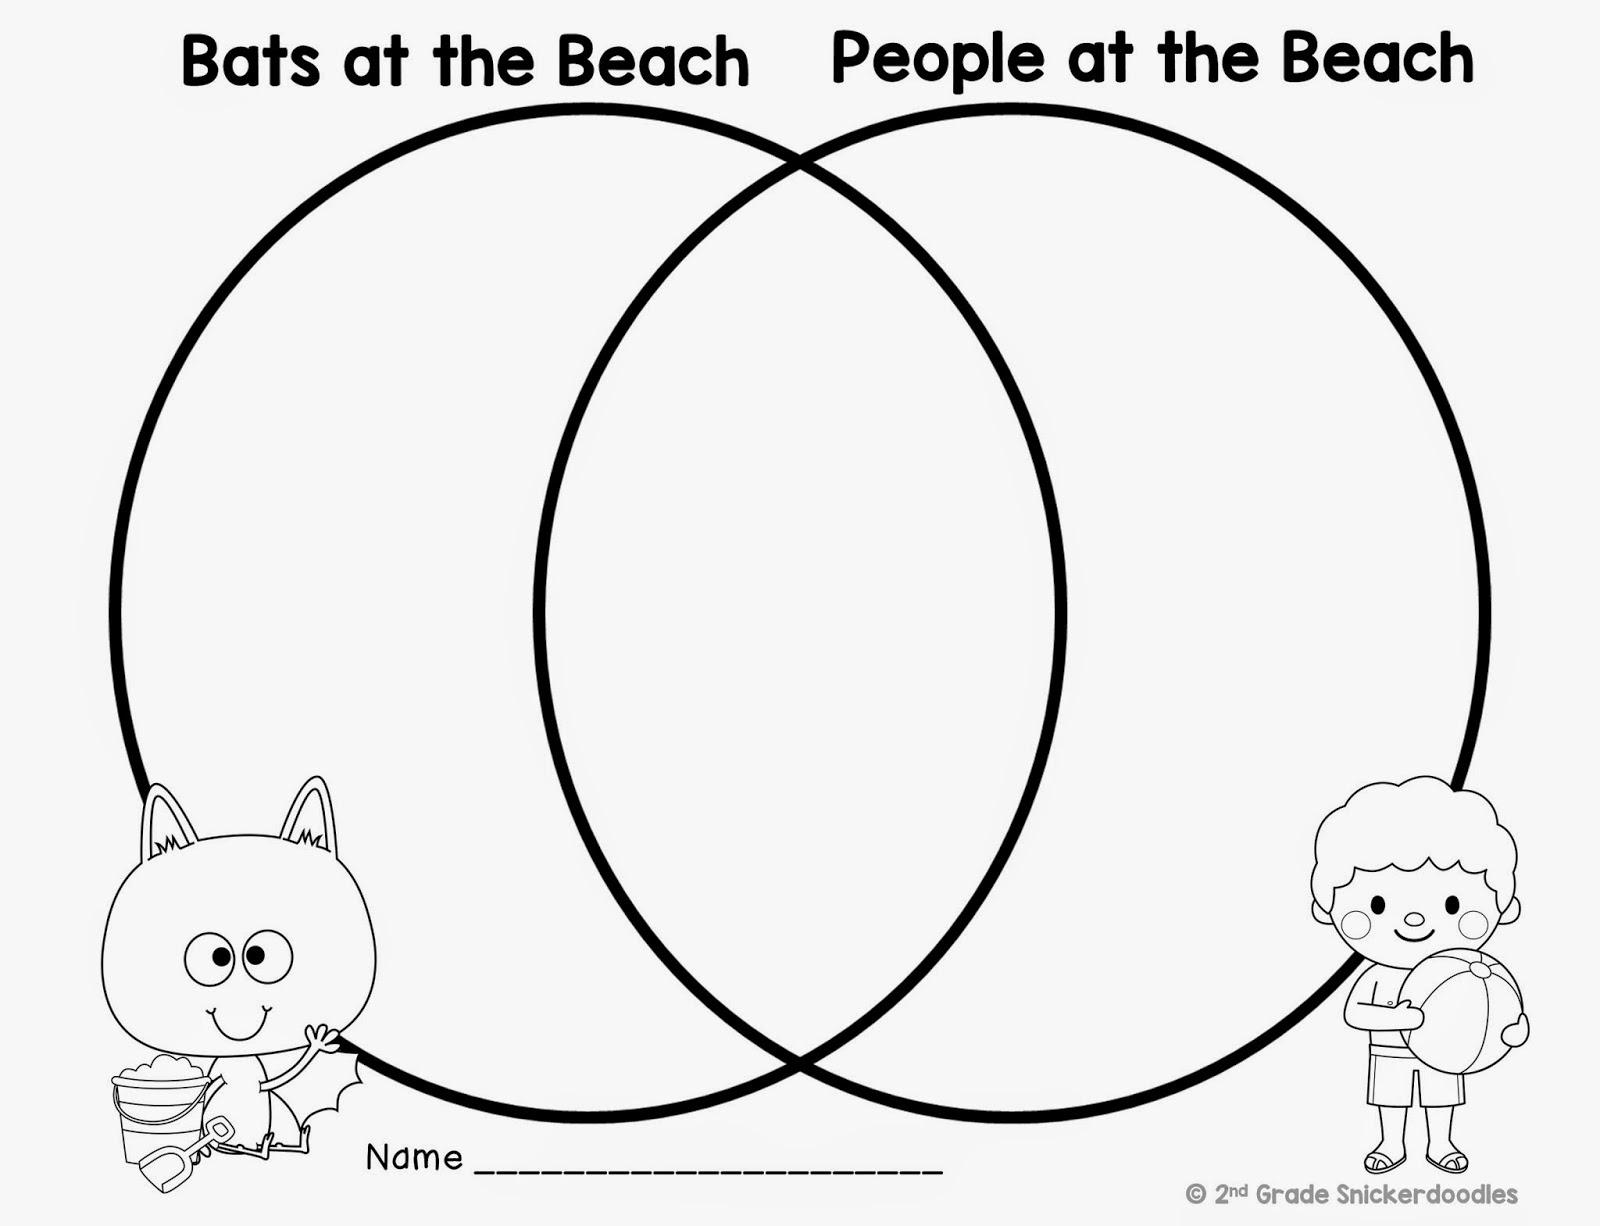 2nd Grade Snickerdoodles Bats At The Beach Freebie